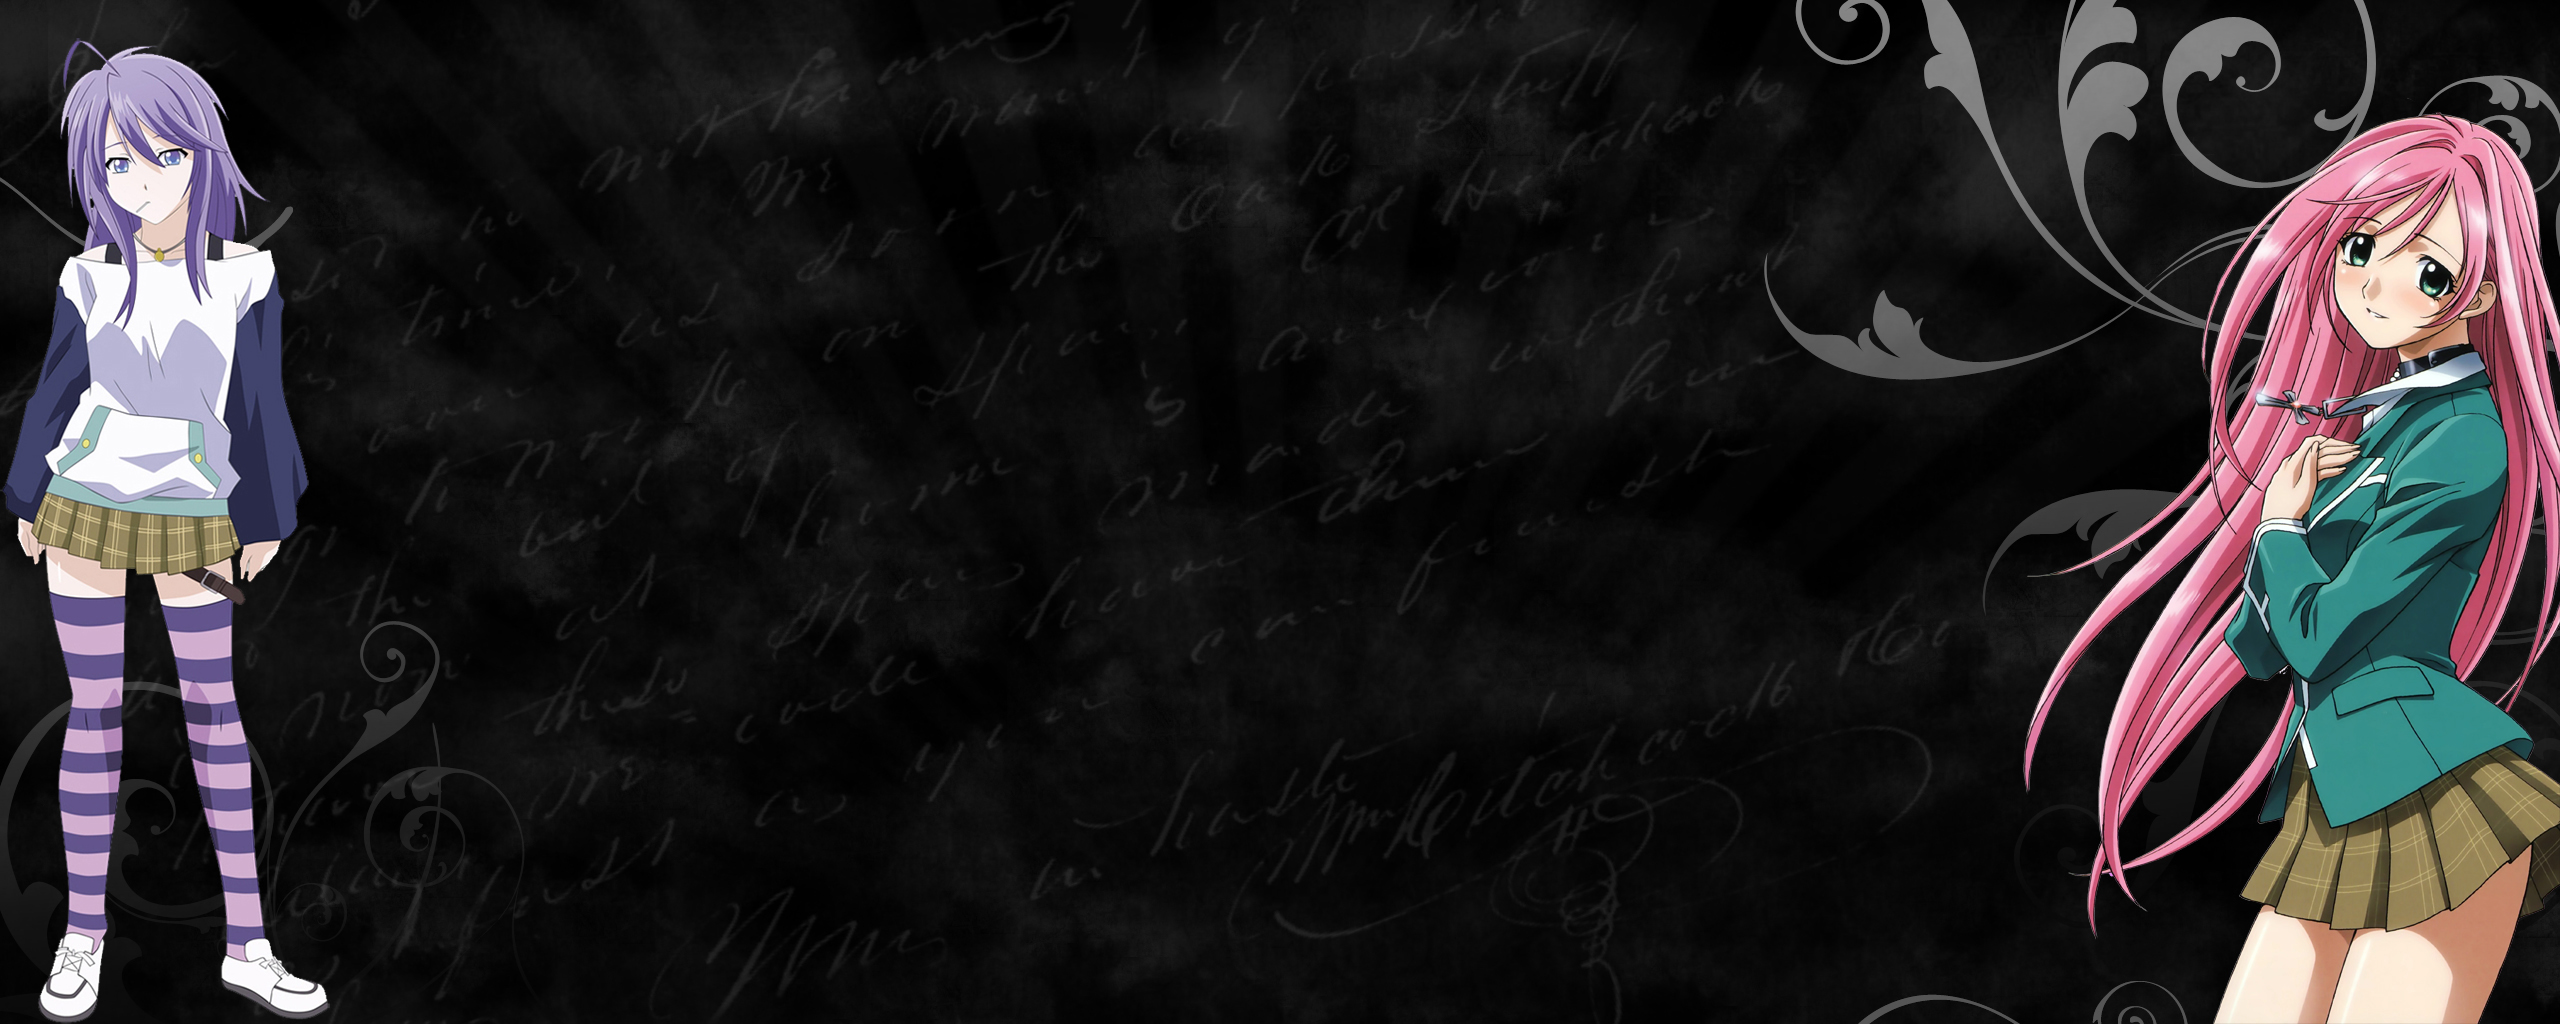 Rosario Vampire my wallpaper 2560x1024